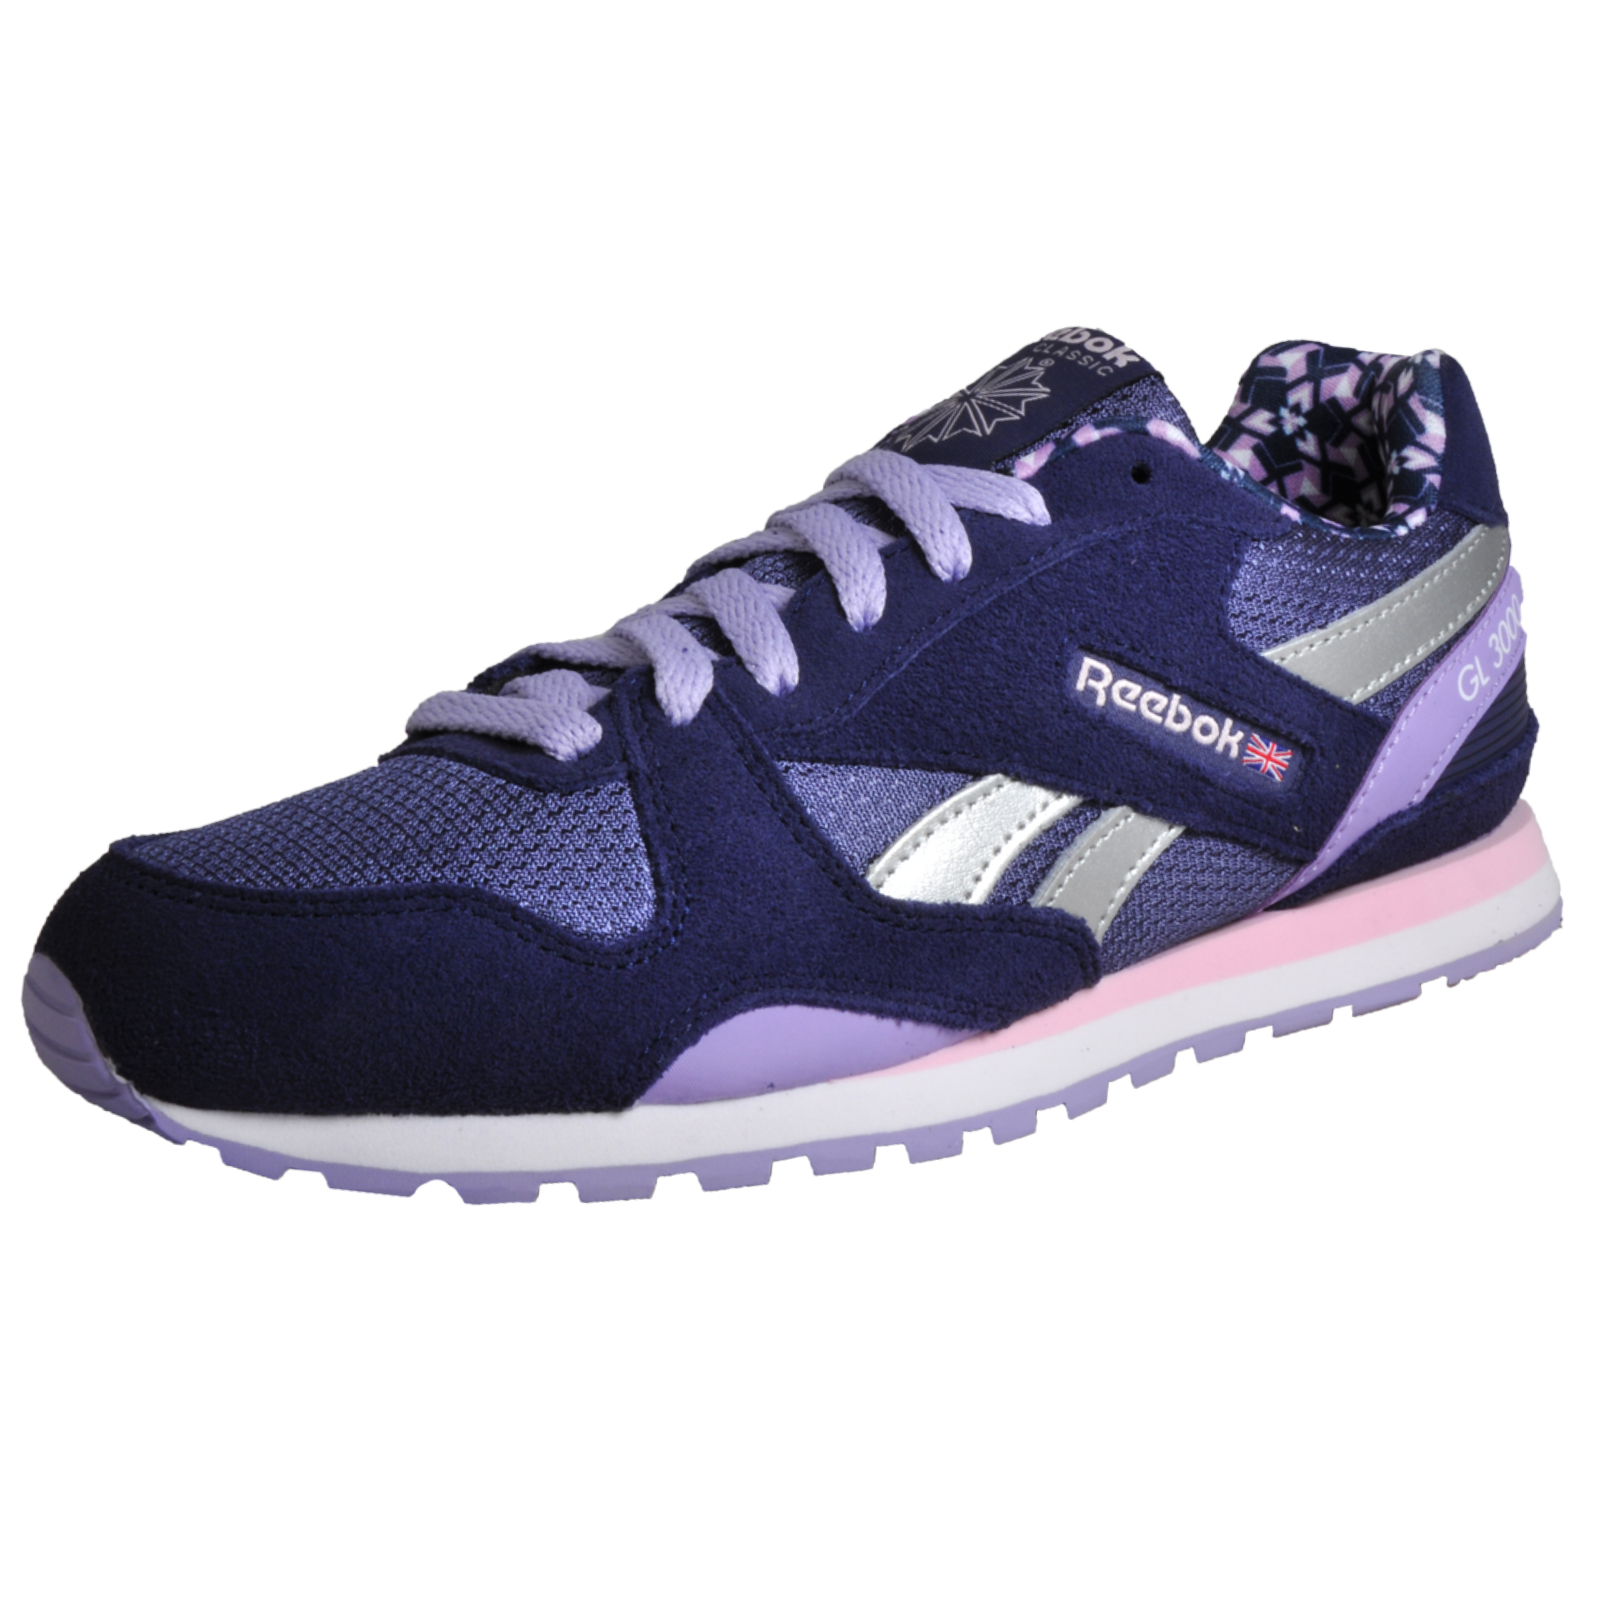 Details about Reebok Classic GL 3000 Women s Girls Casual Retro Fashion  Trainers Blue 208aa9c90b